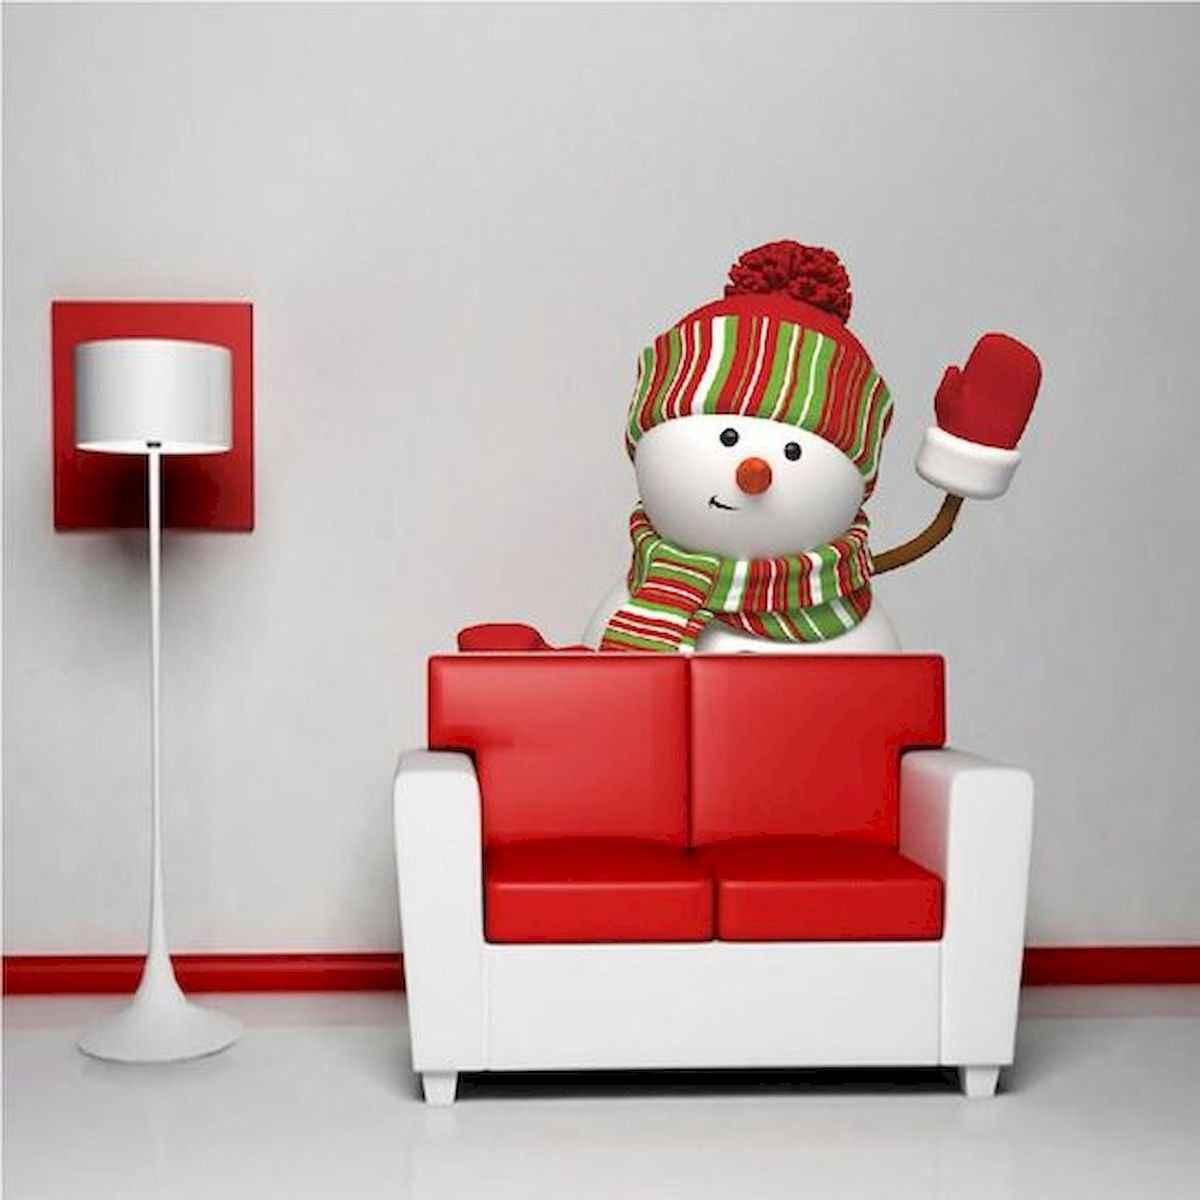 35 Awesome Apartment Christmas Decor Ideas (14)